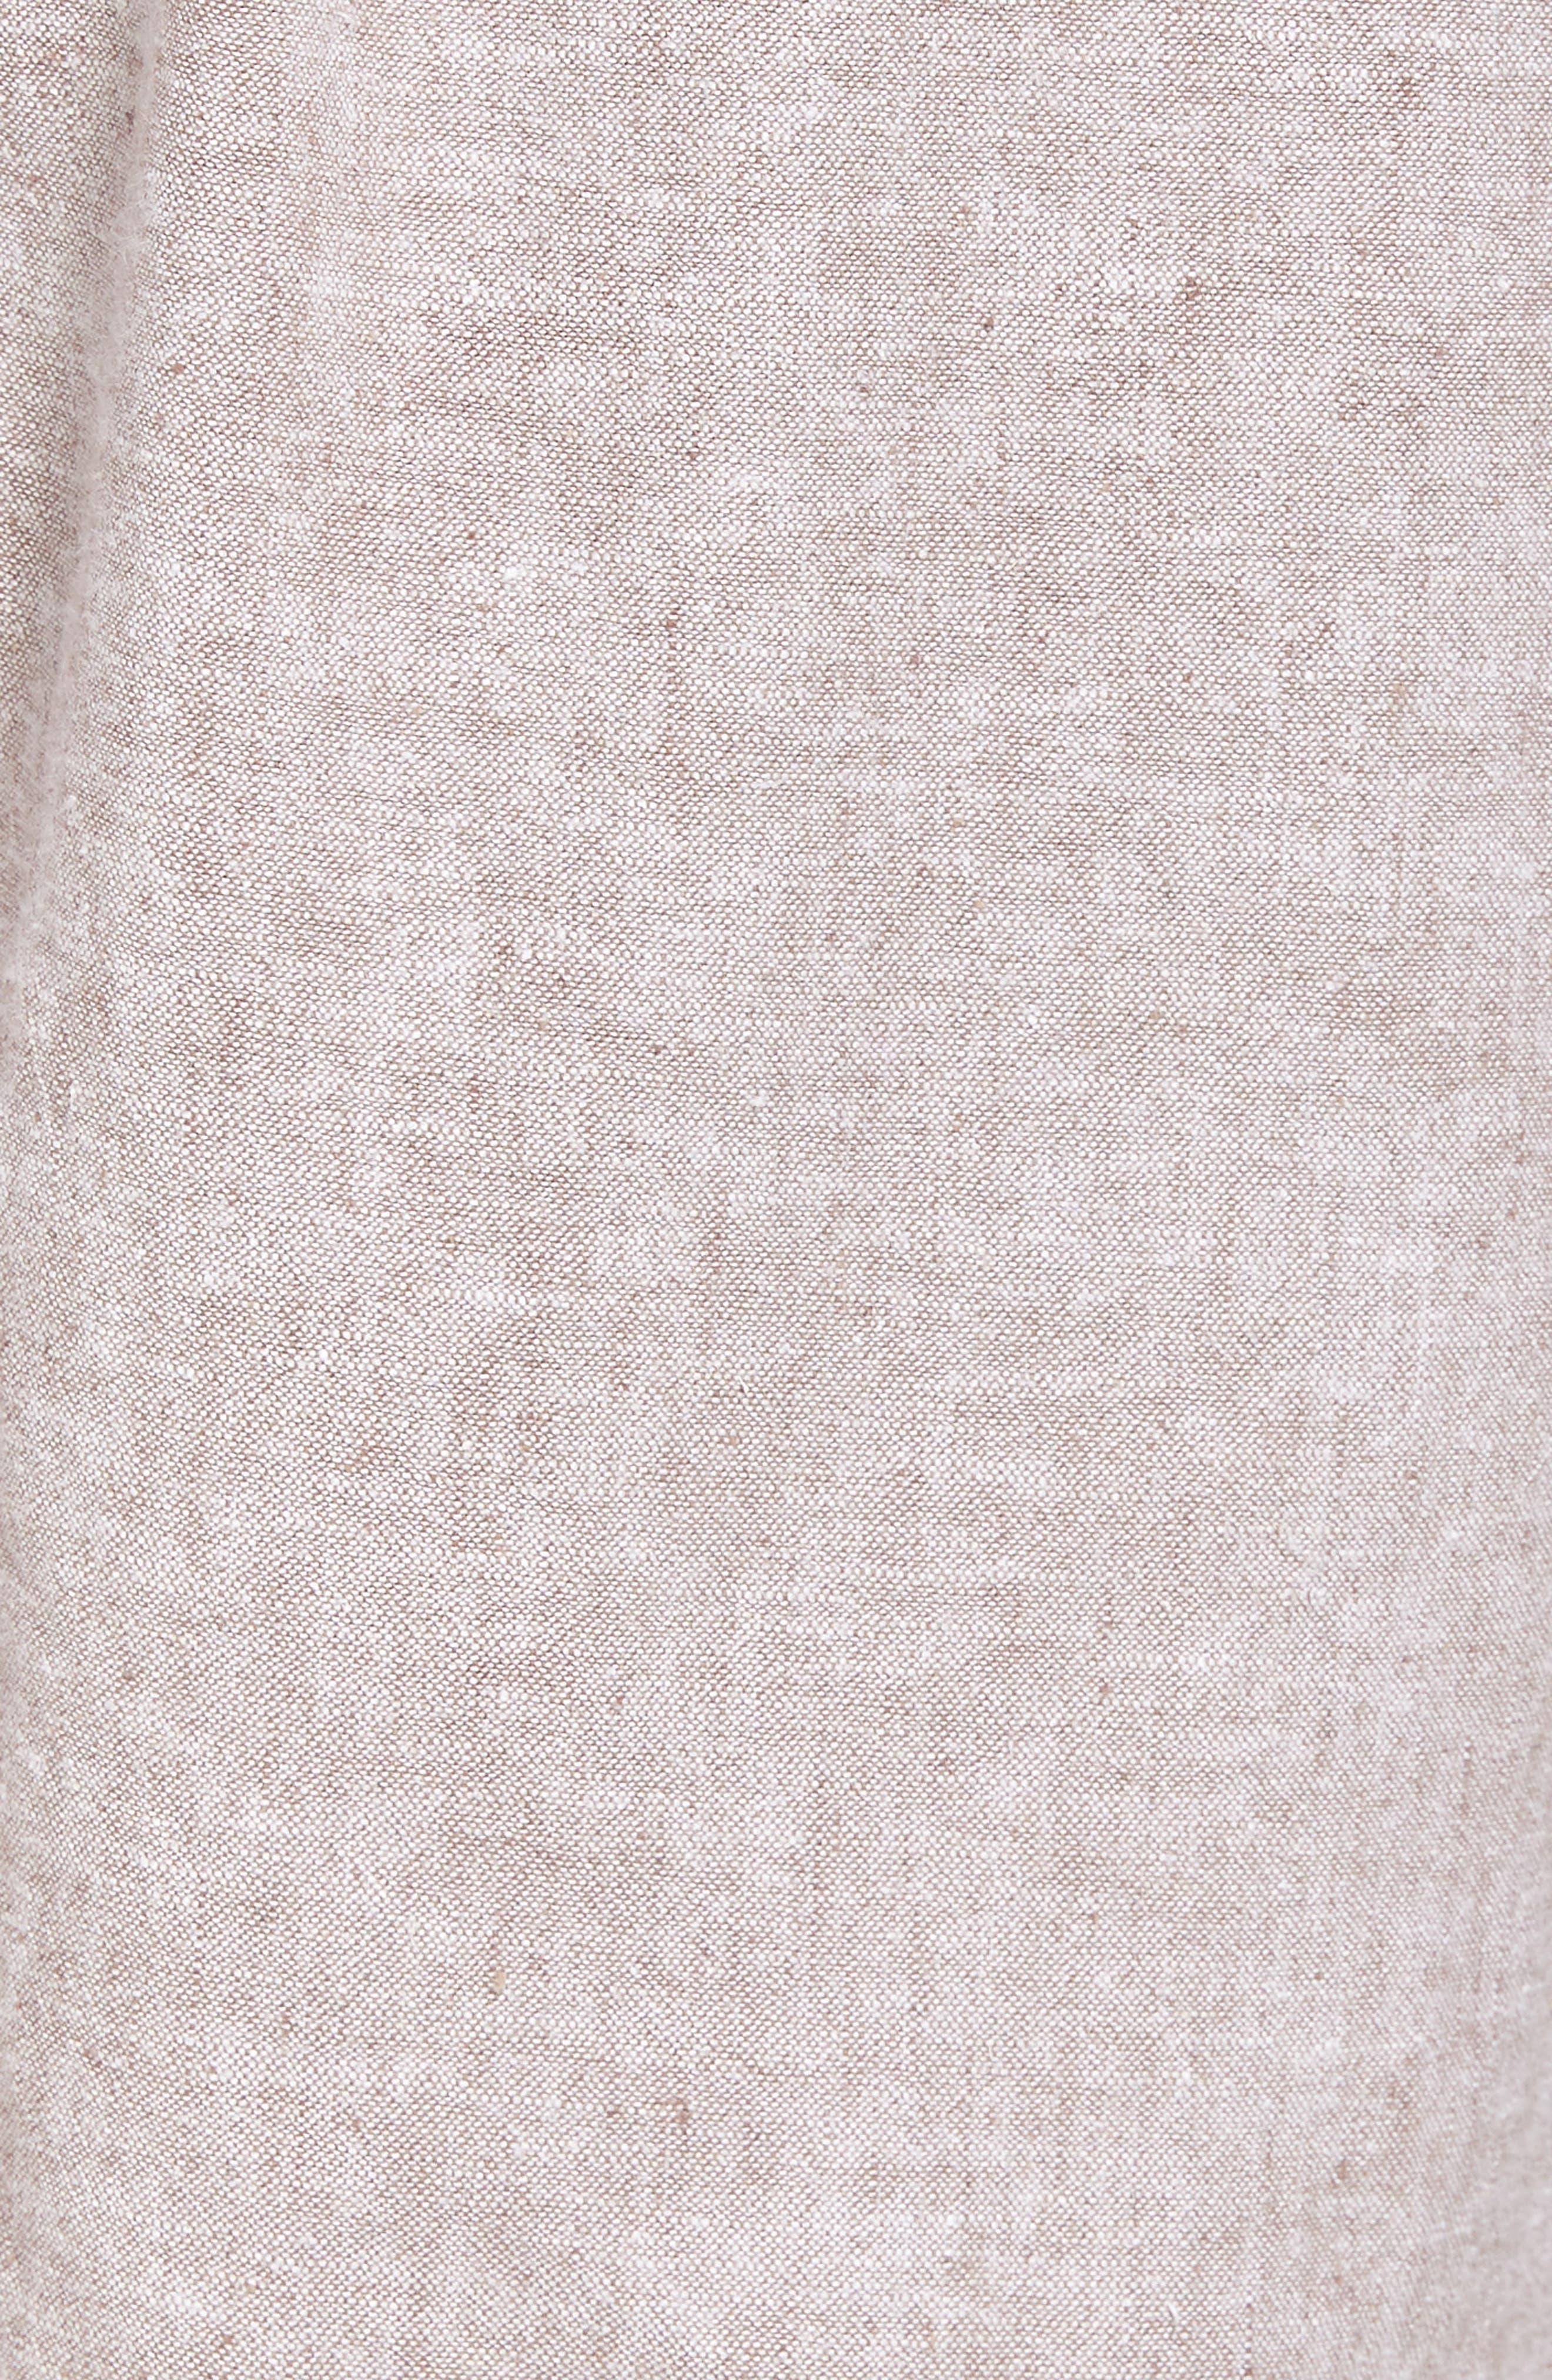 Drawstring Linen Blend Shorts,                             Alternate thumbnail 5, color,                             235